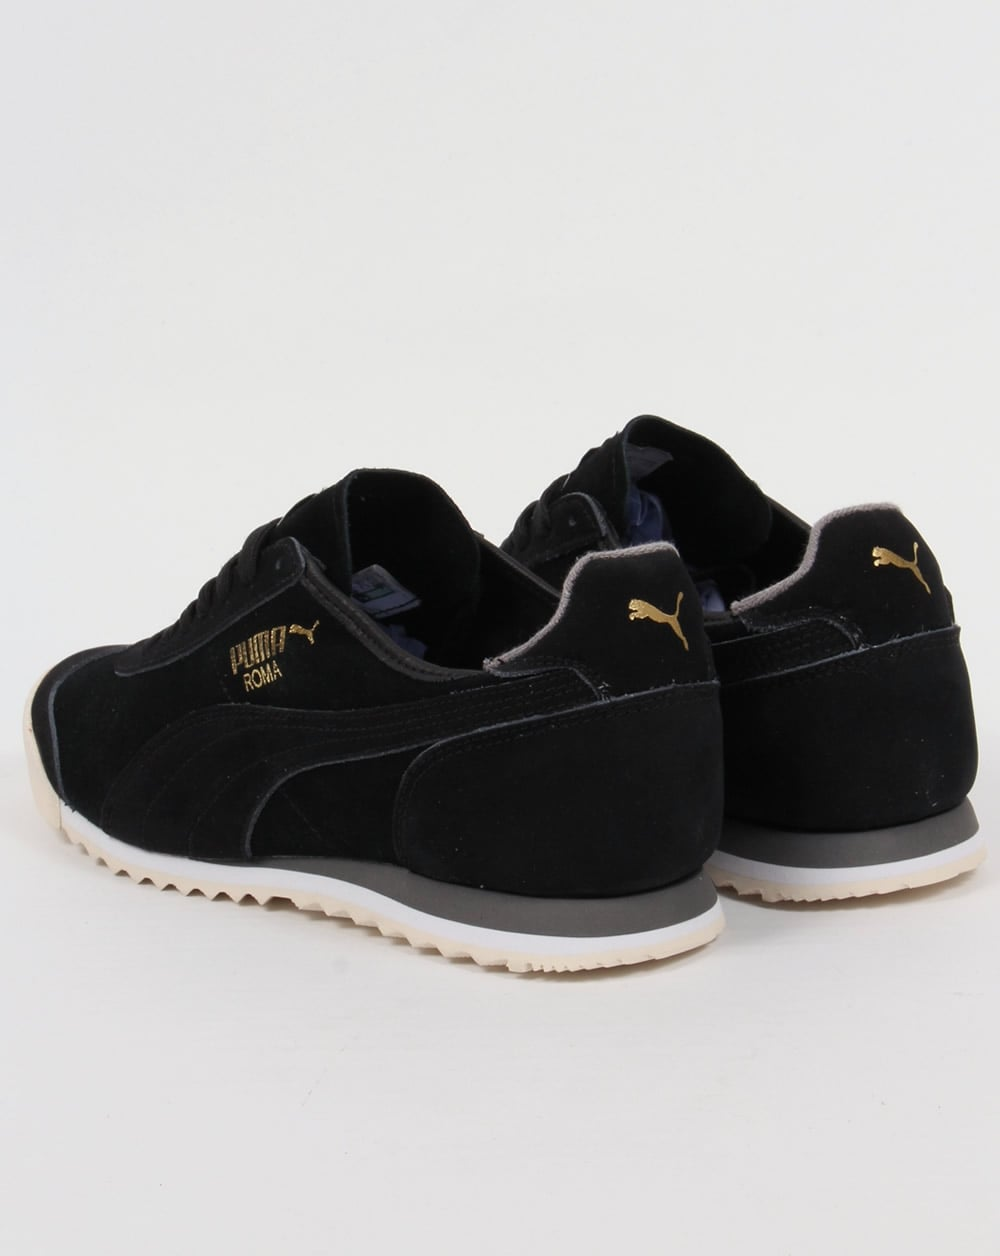 153f12ebd0f3 Puma Roma OG Leather Trainers Black Grey